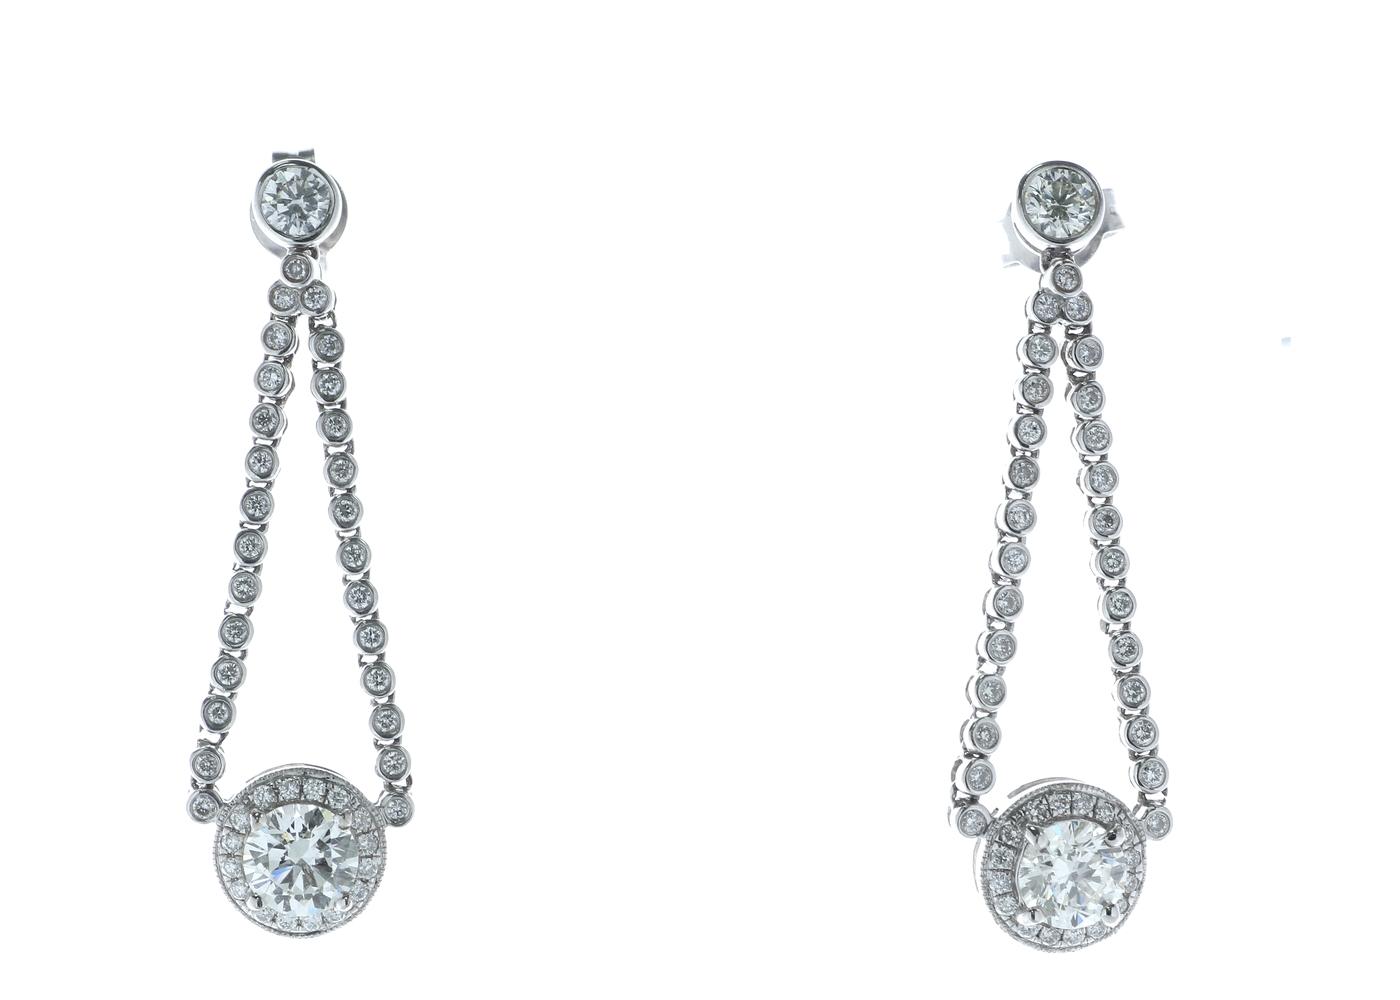 18ct White Gold Diamond Halo Drop Earrings 2.20 Carats